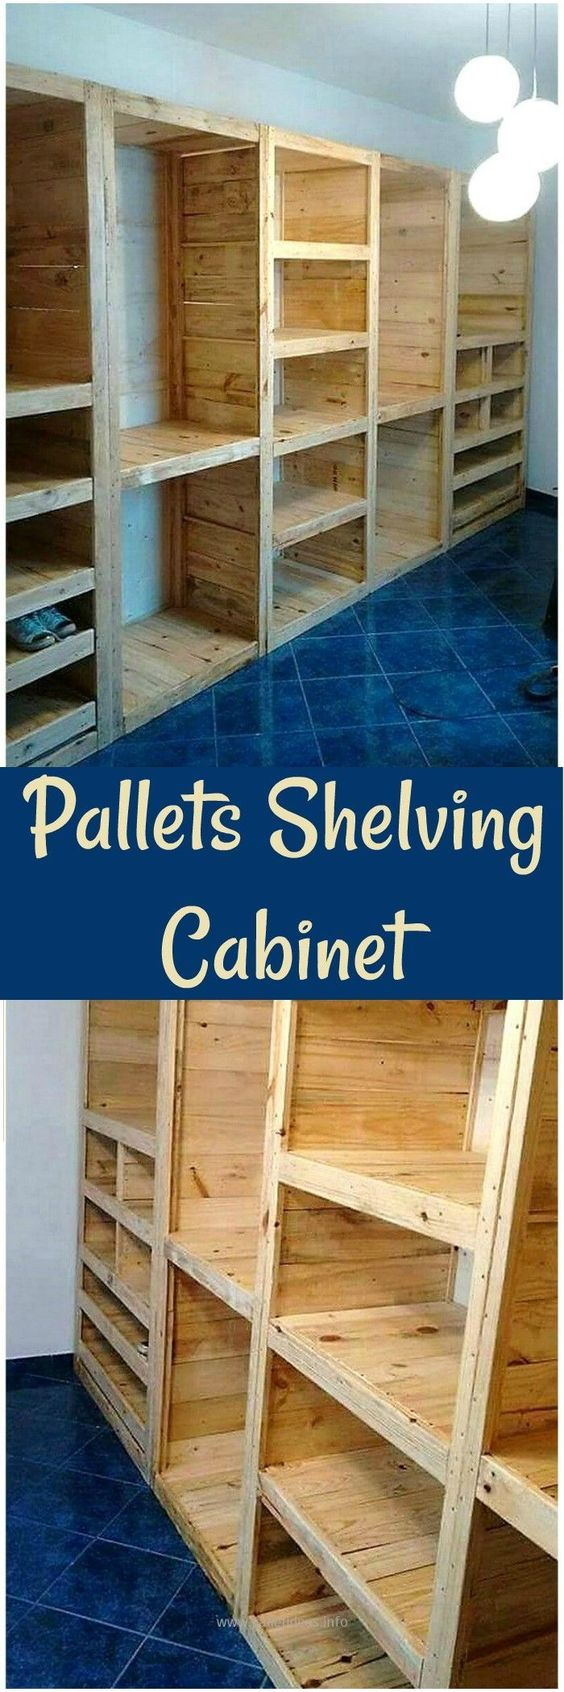 Pallets Shelving Cabinet - wooden pallet #woodenpalletfurniture